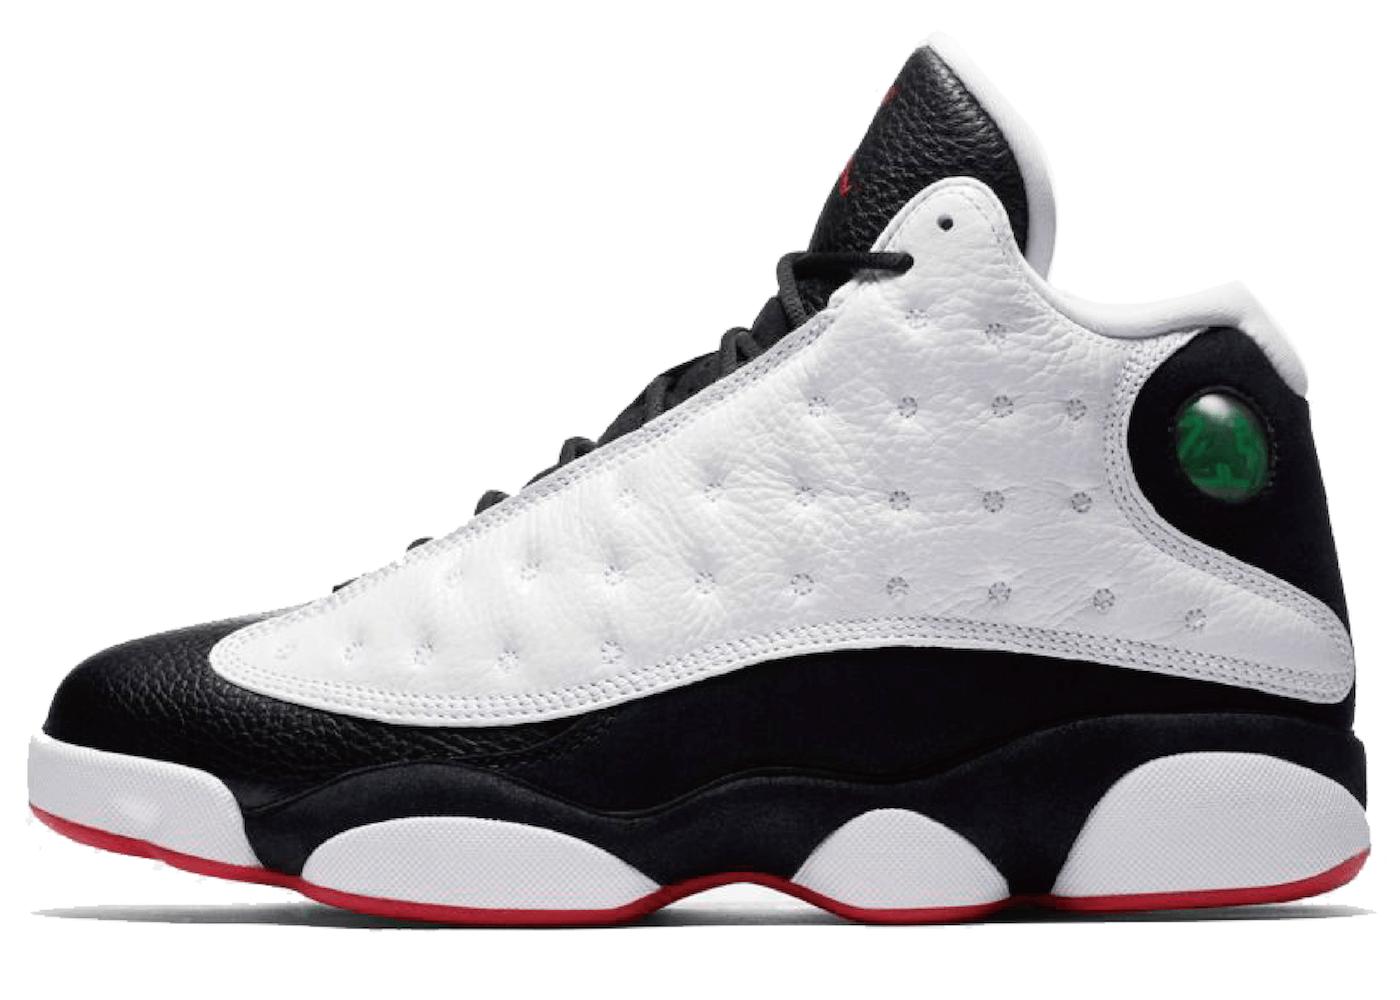 Nike Jordan 13 Retro He Got Game (2018)の写真